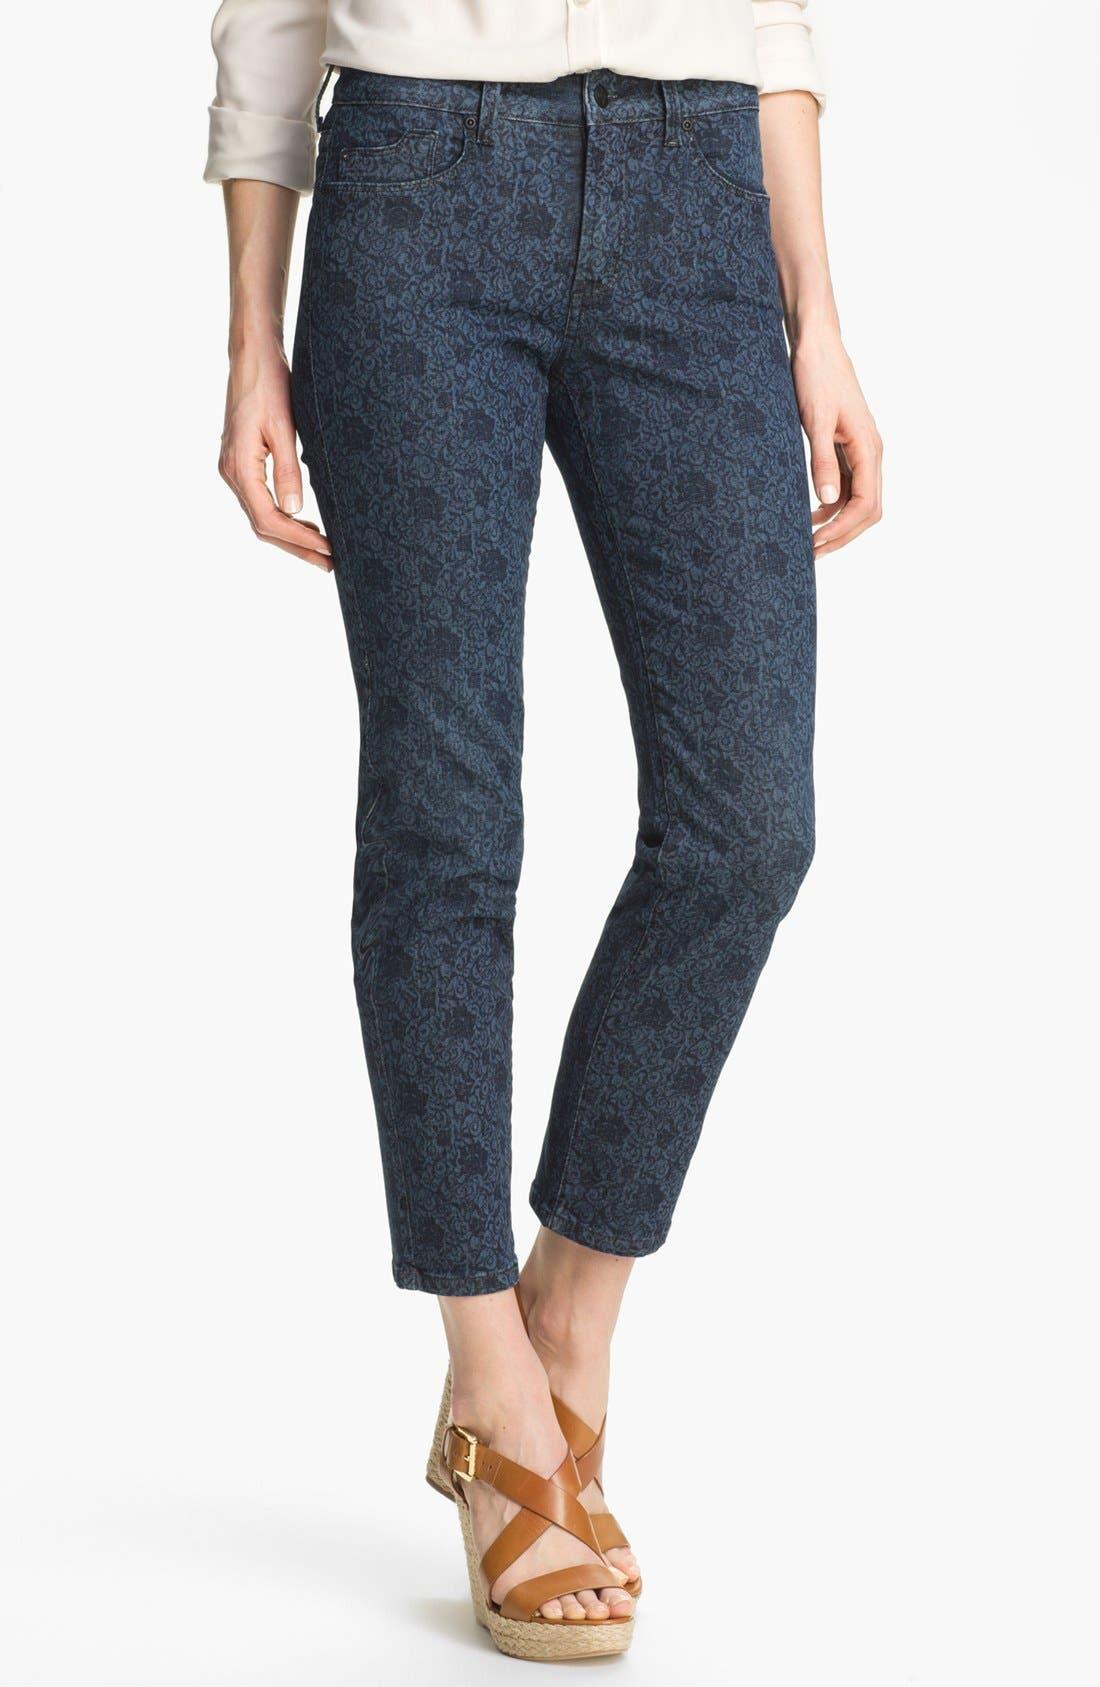 Alternate Image 1 Selected - NYDJ 'Alisha' Print Stretch Ankle Skinny Jeans (Petite)